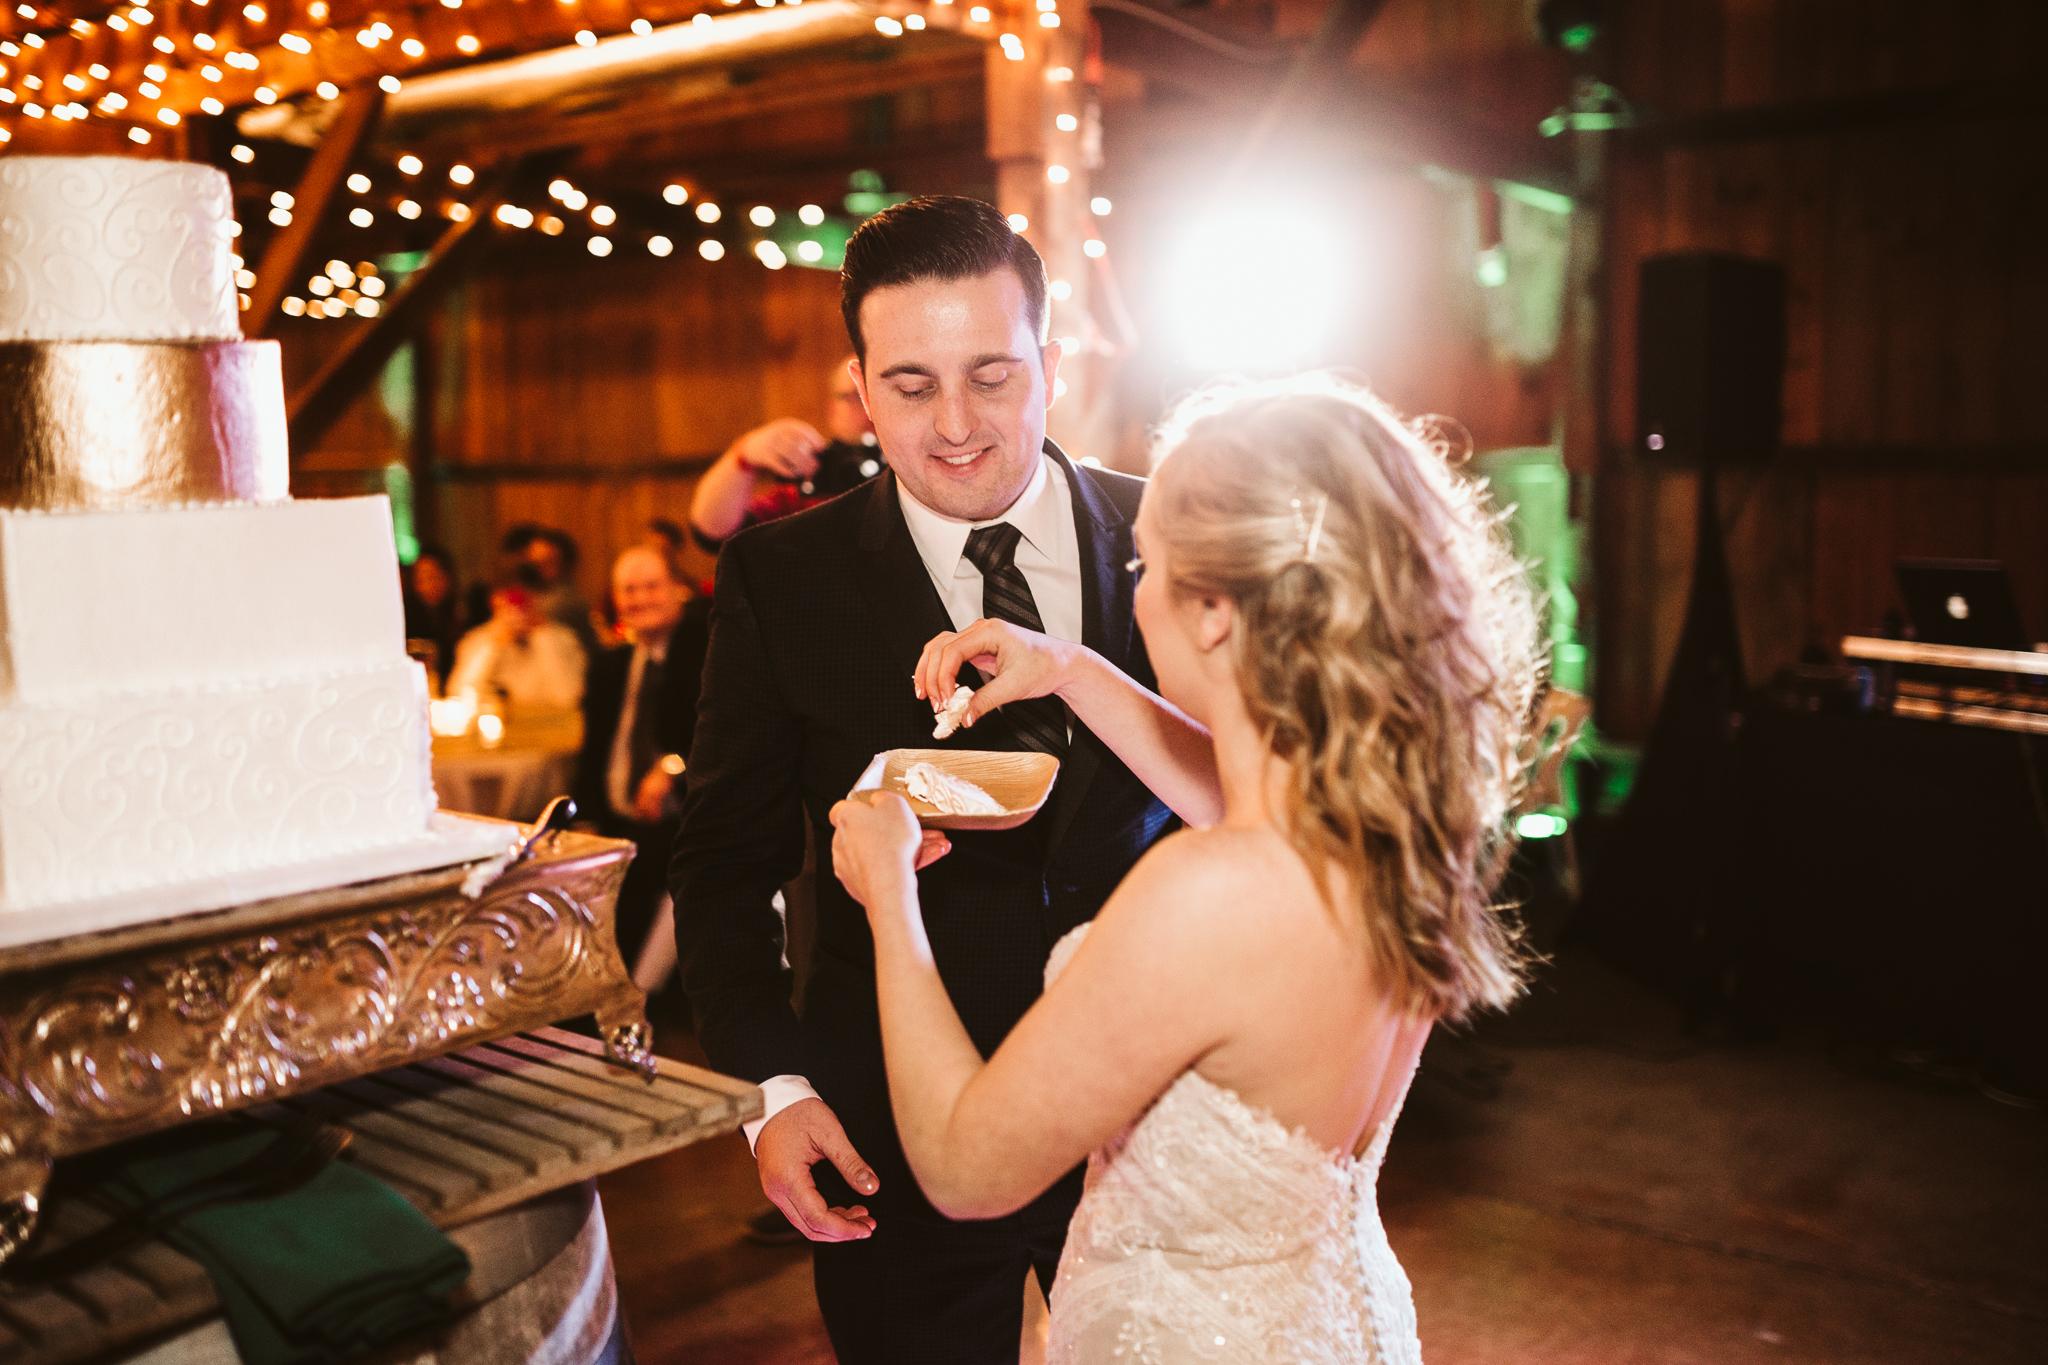 0162 Ariana Jordan Photo - Cameron & Lauren's Wedding at Talon Winery  7585.jpg